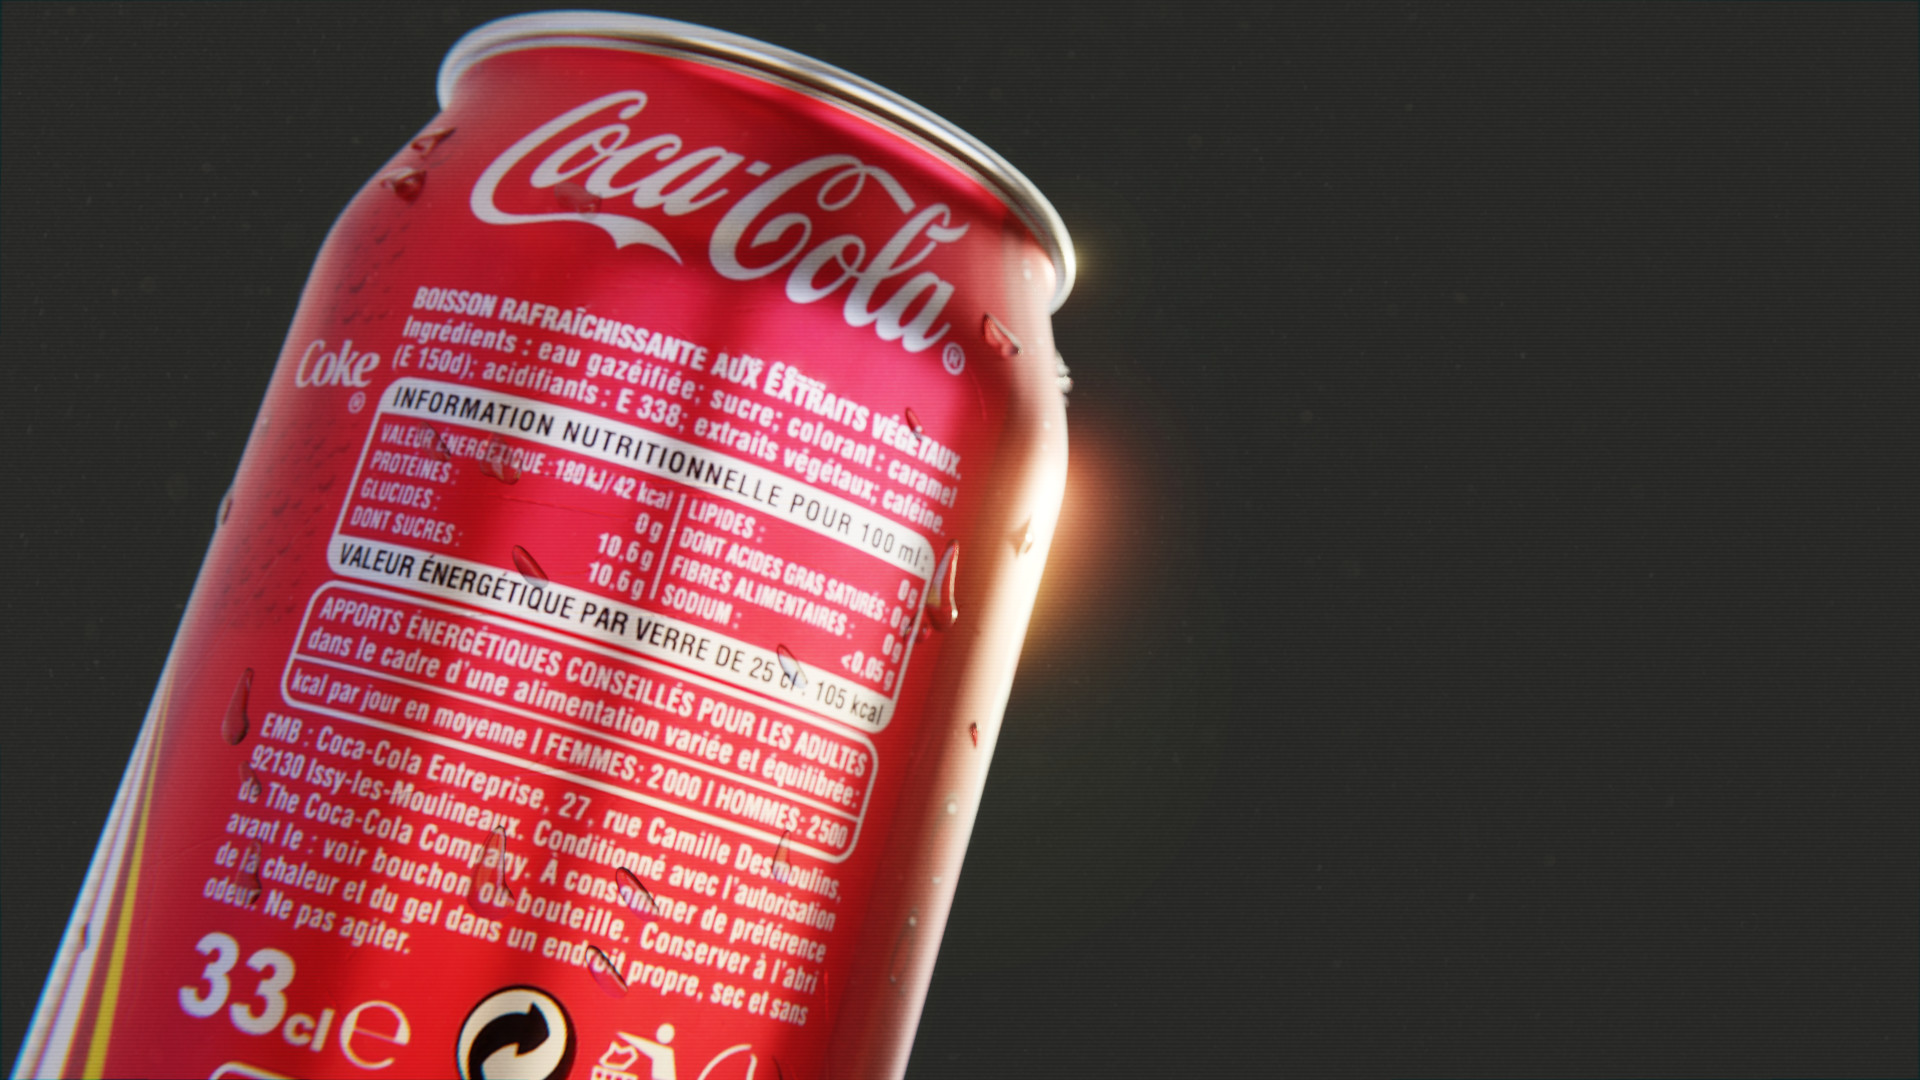 Coke ingredients